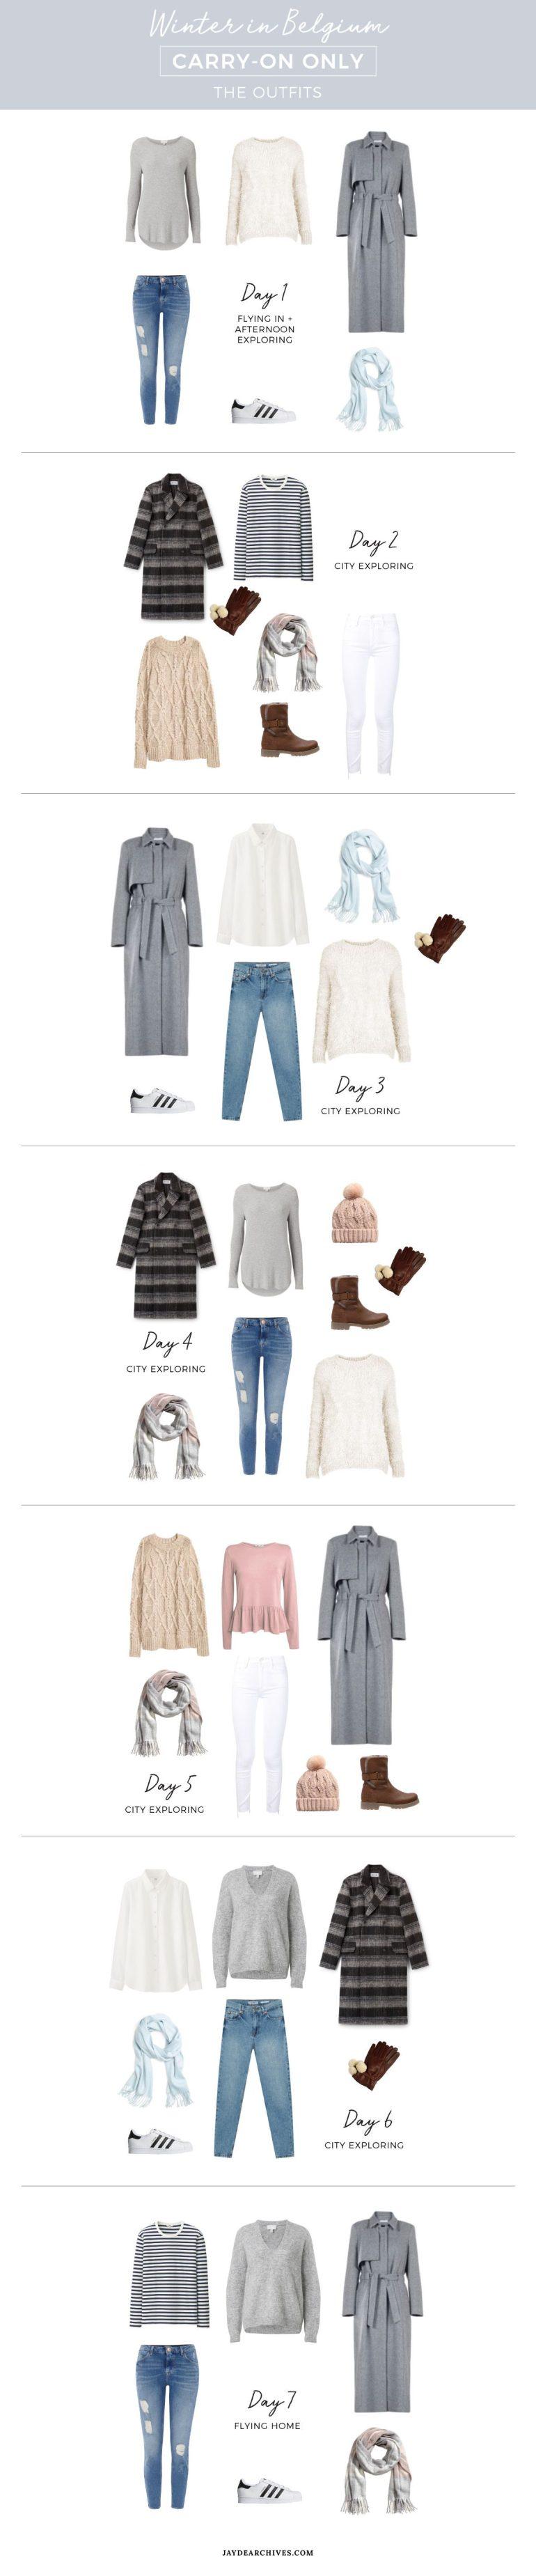 Winter carry-on only wardrobe for Belgium / Travel light packing list